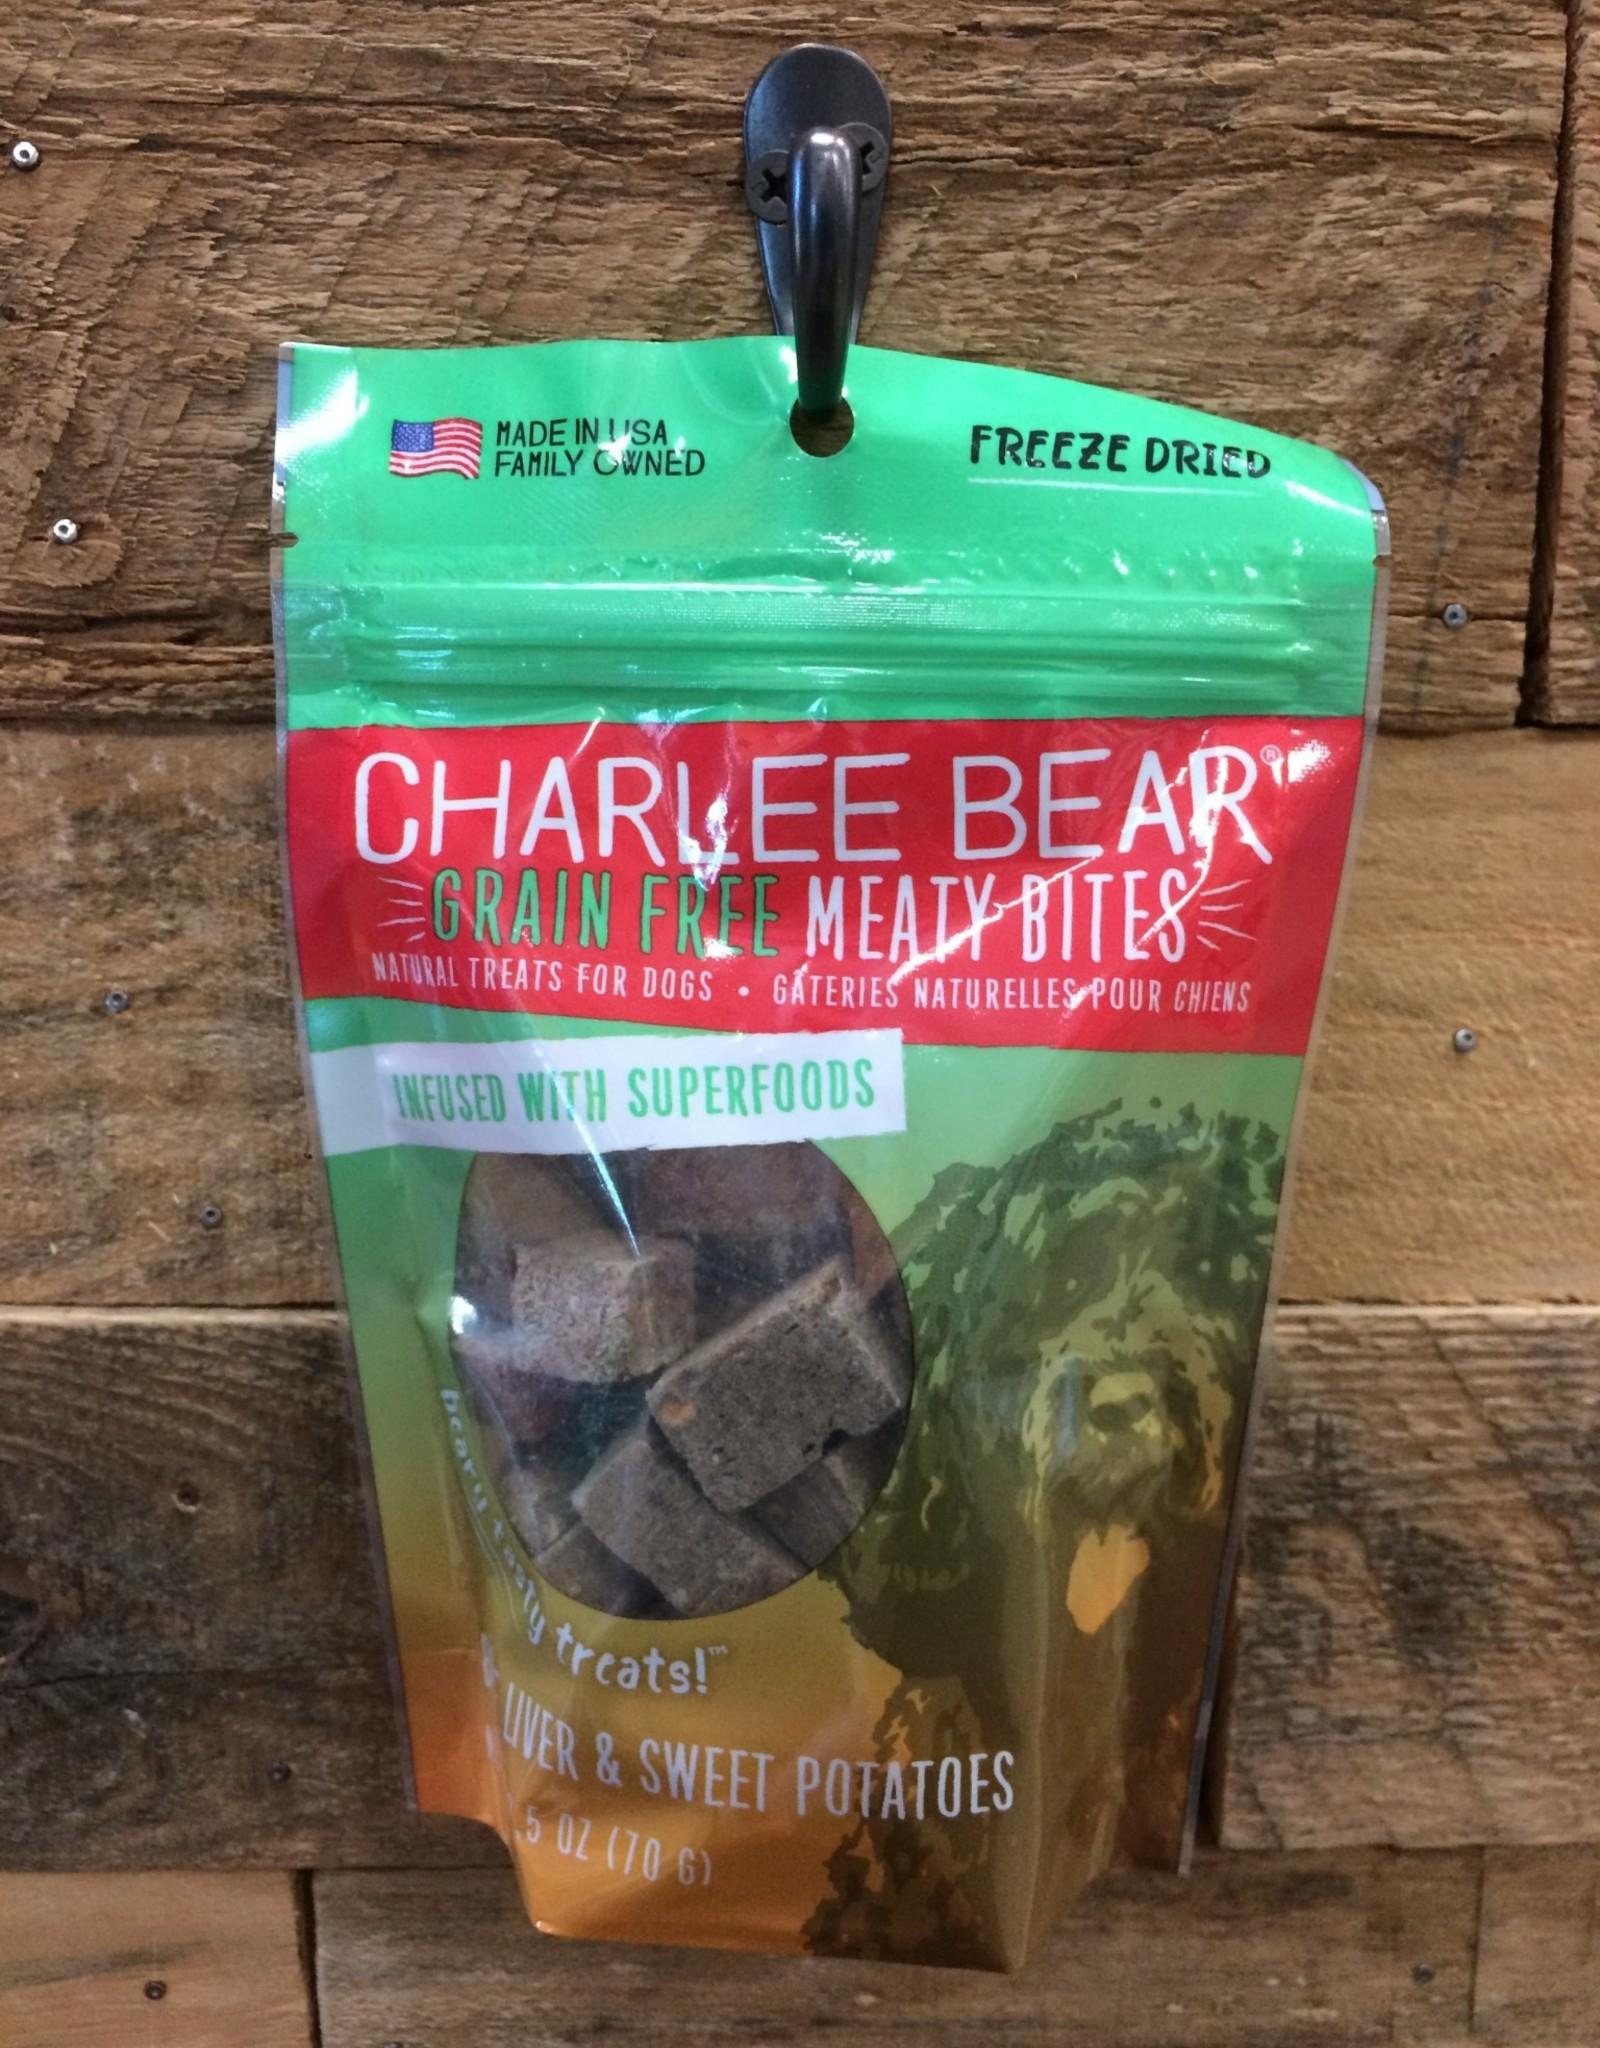 Charlie Bear Farms Charlee Bear Meaty Bites - Beef Liver w/ Sweet Potato 2.5 oz